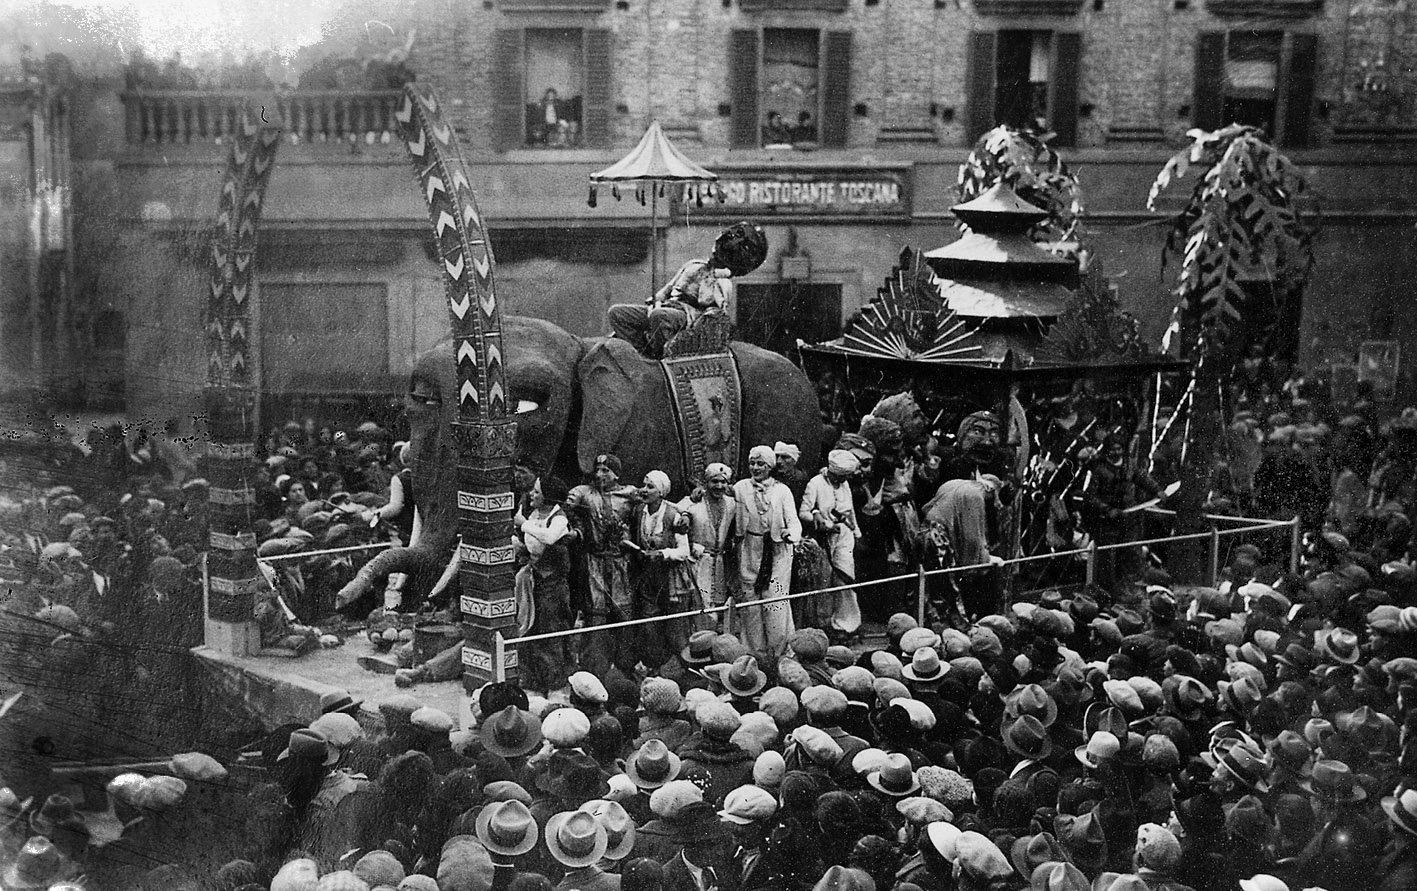 UN PO' D'ORIENTE AL CARNEVALE-1934